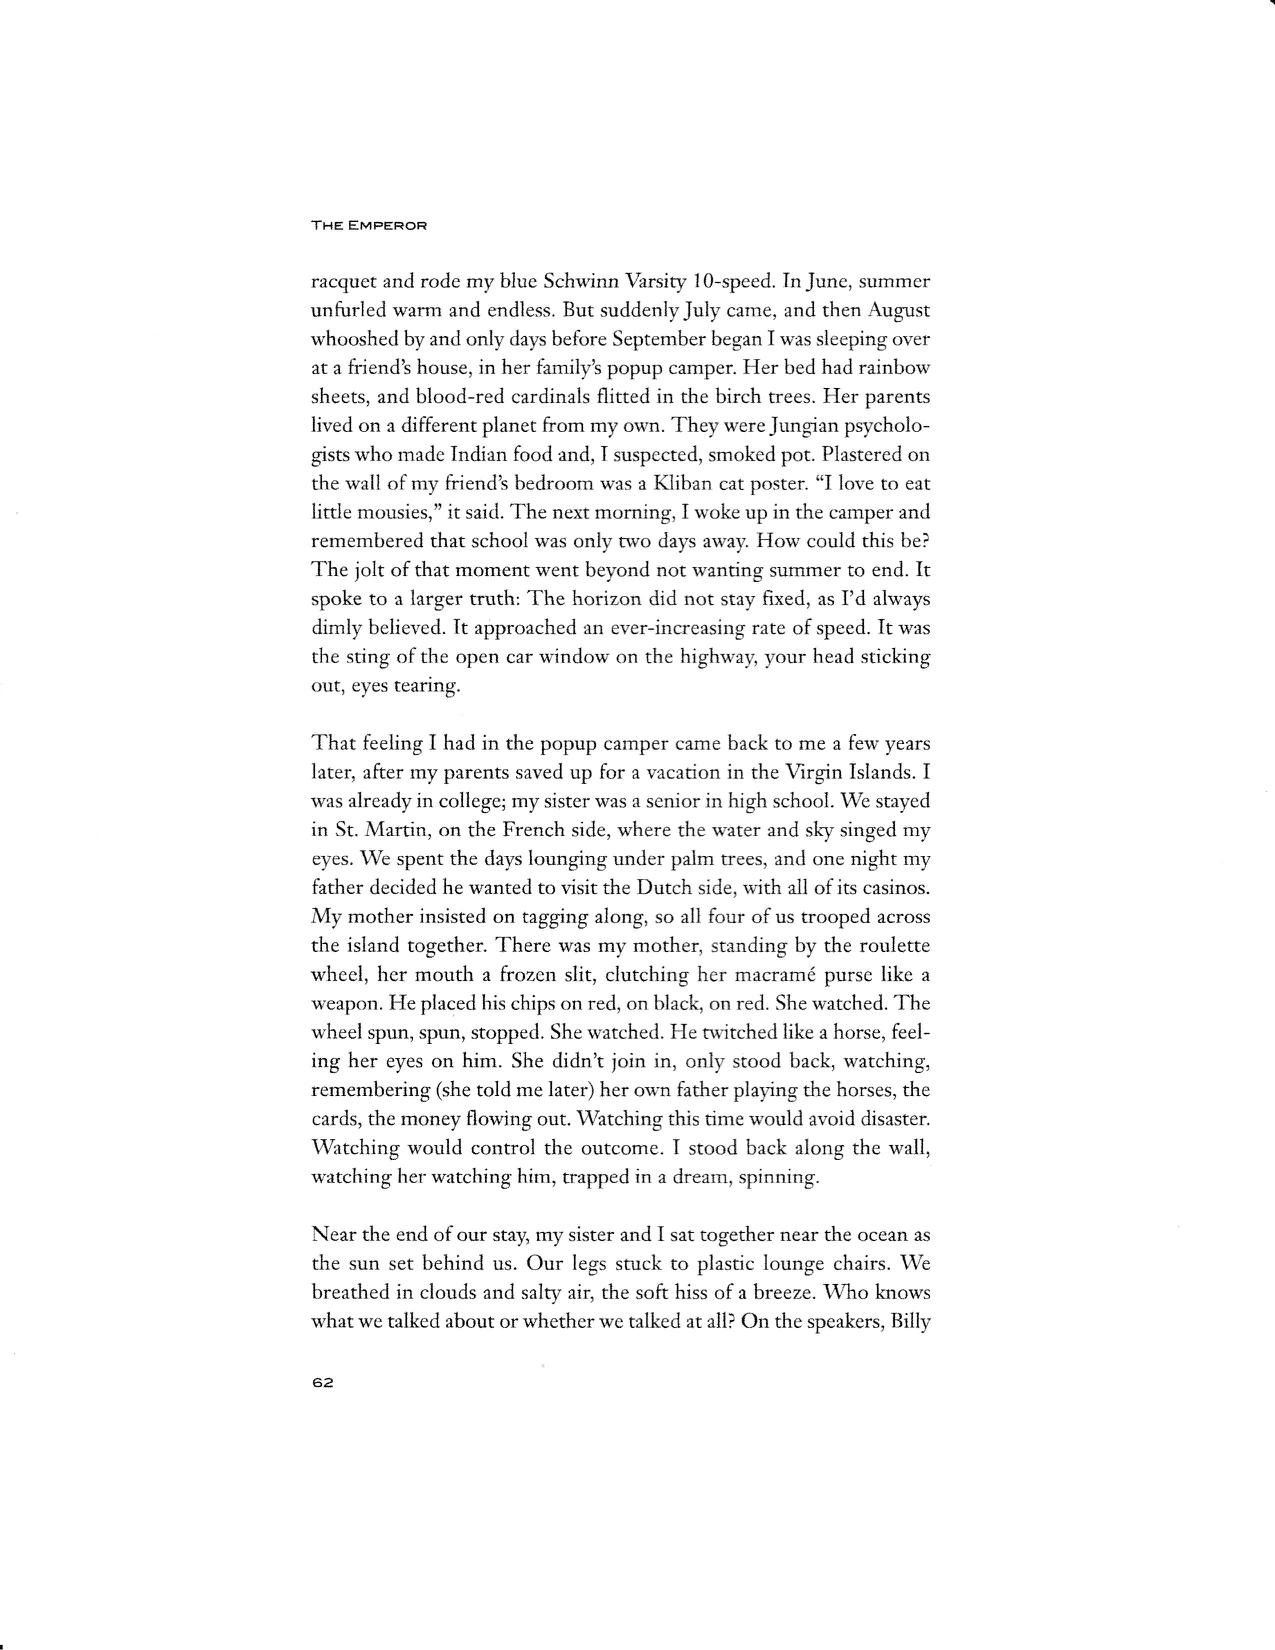 Tahoma_Literary_Review_The_Emperor 06.jpg